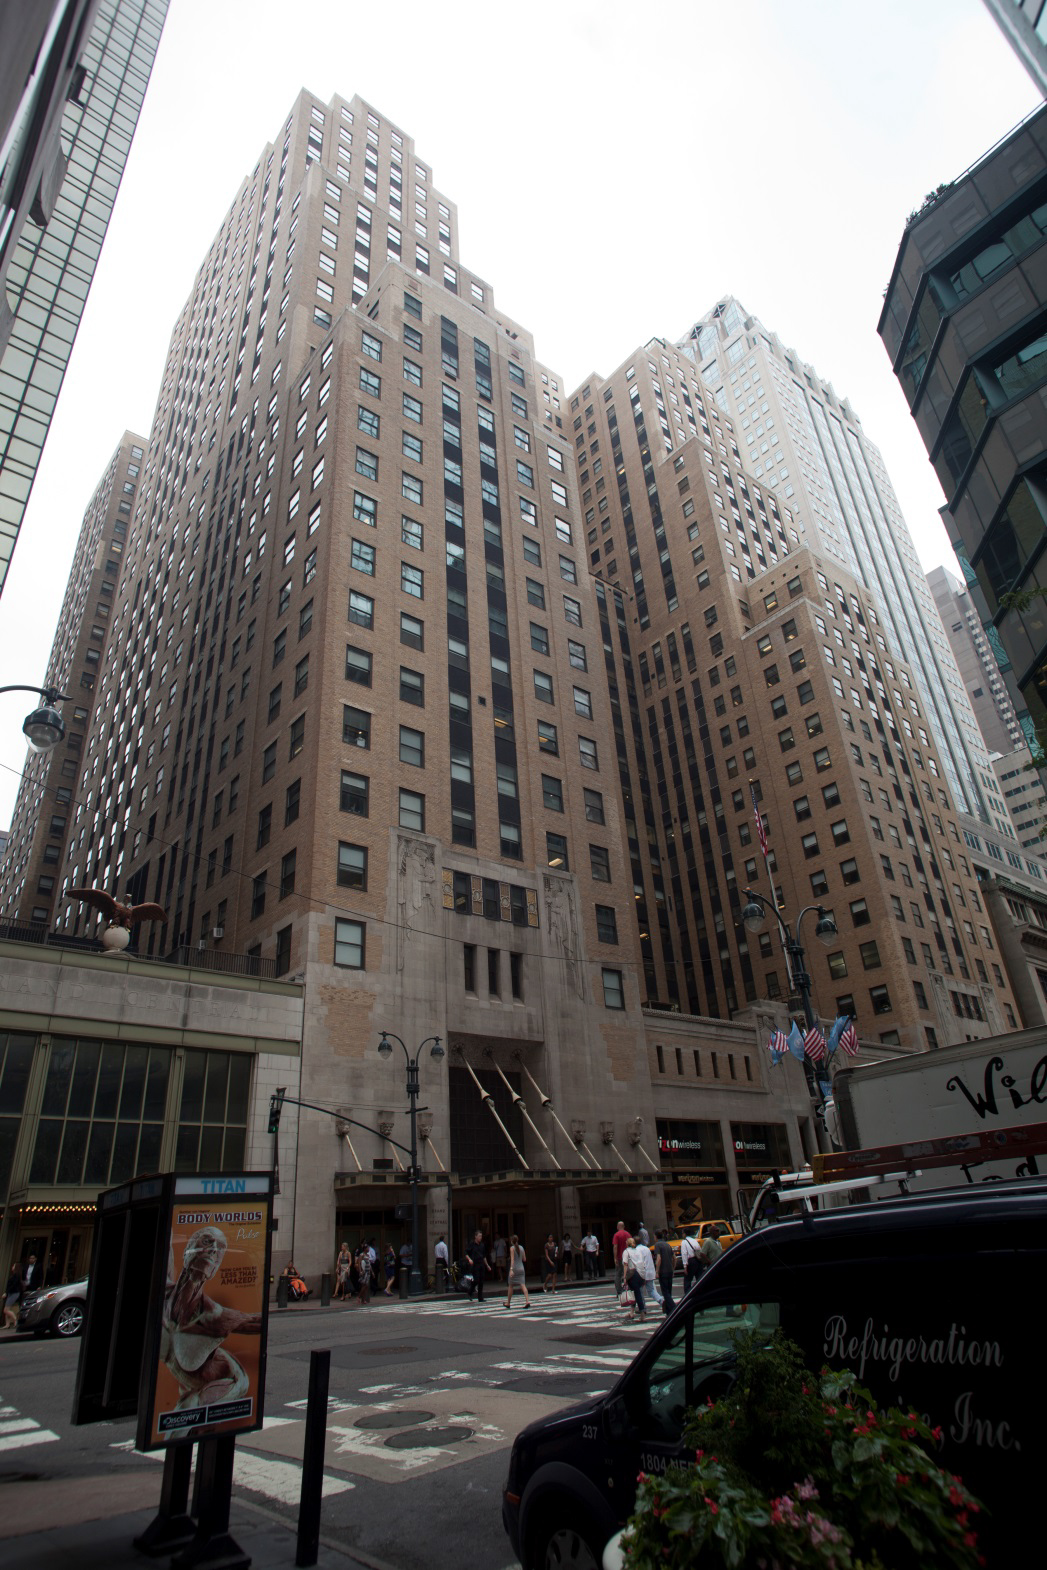 The Graybar Building